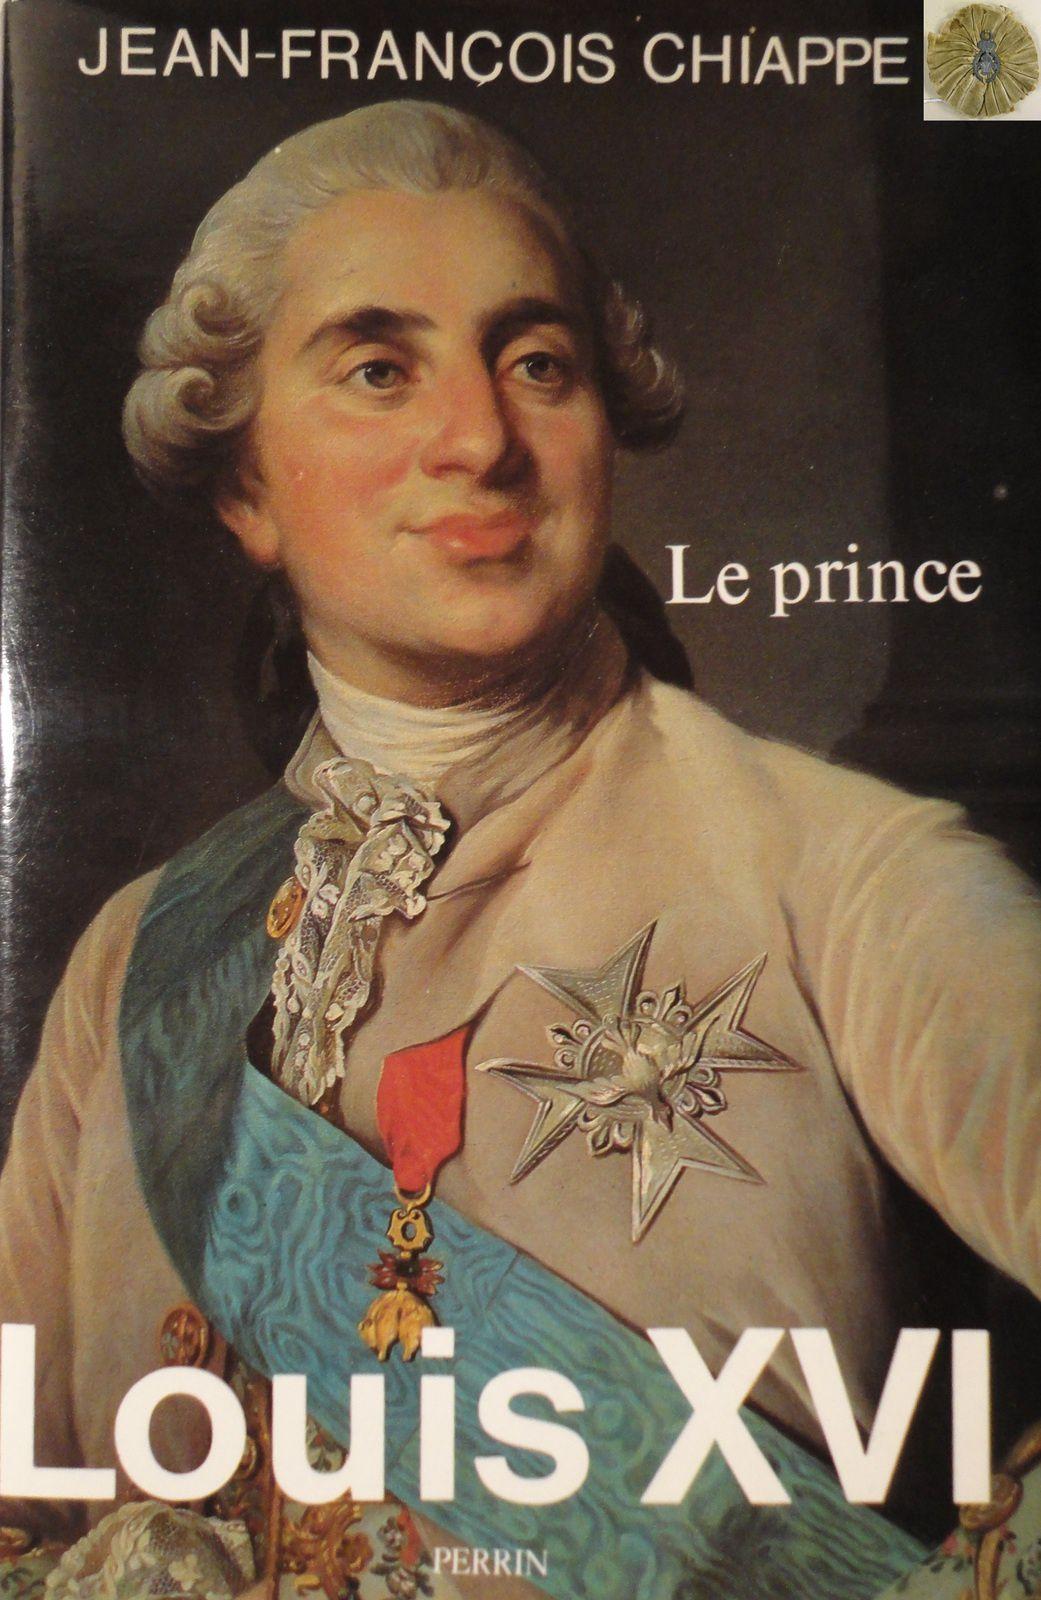 LOUIS XVI - LE PRINCE : JEAN-FRANCOIS CHIAPPE (1987, PERRIN)